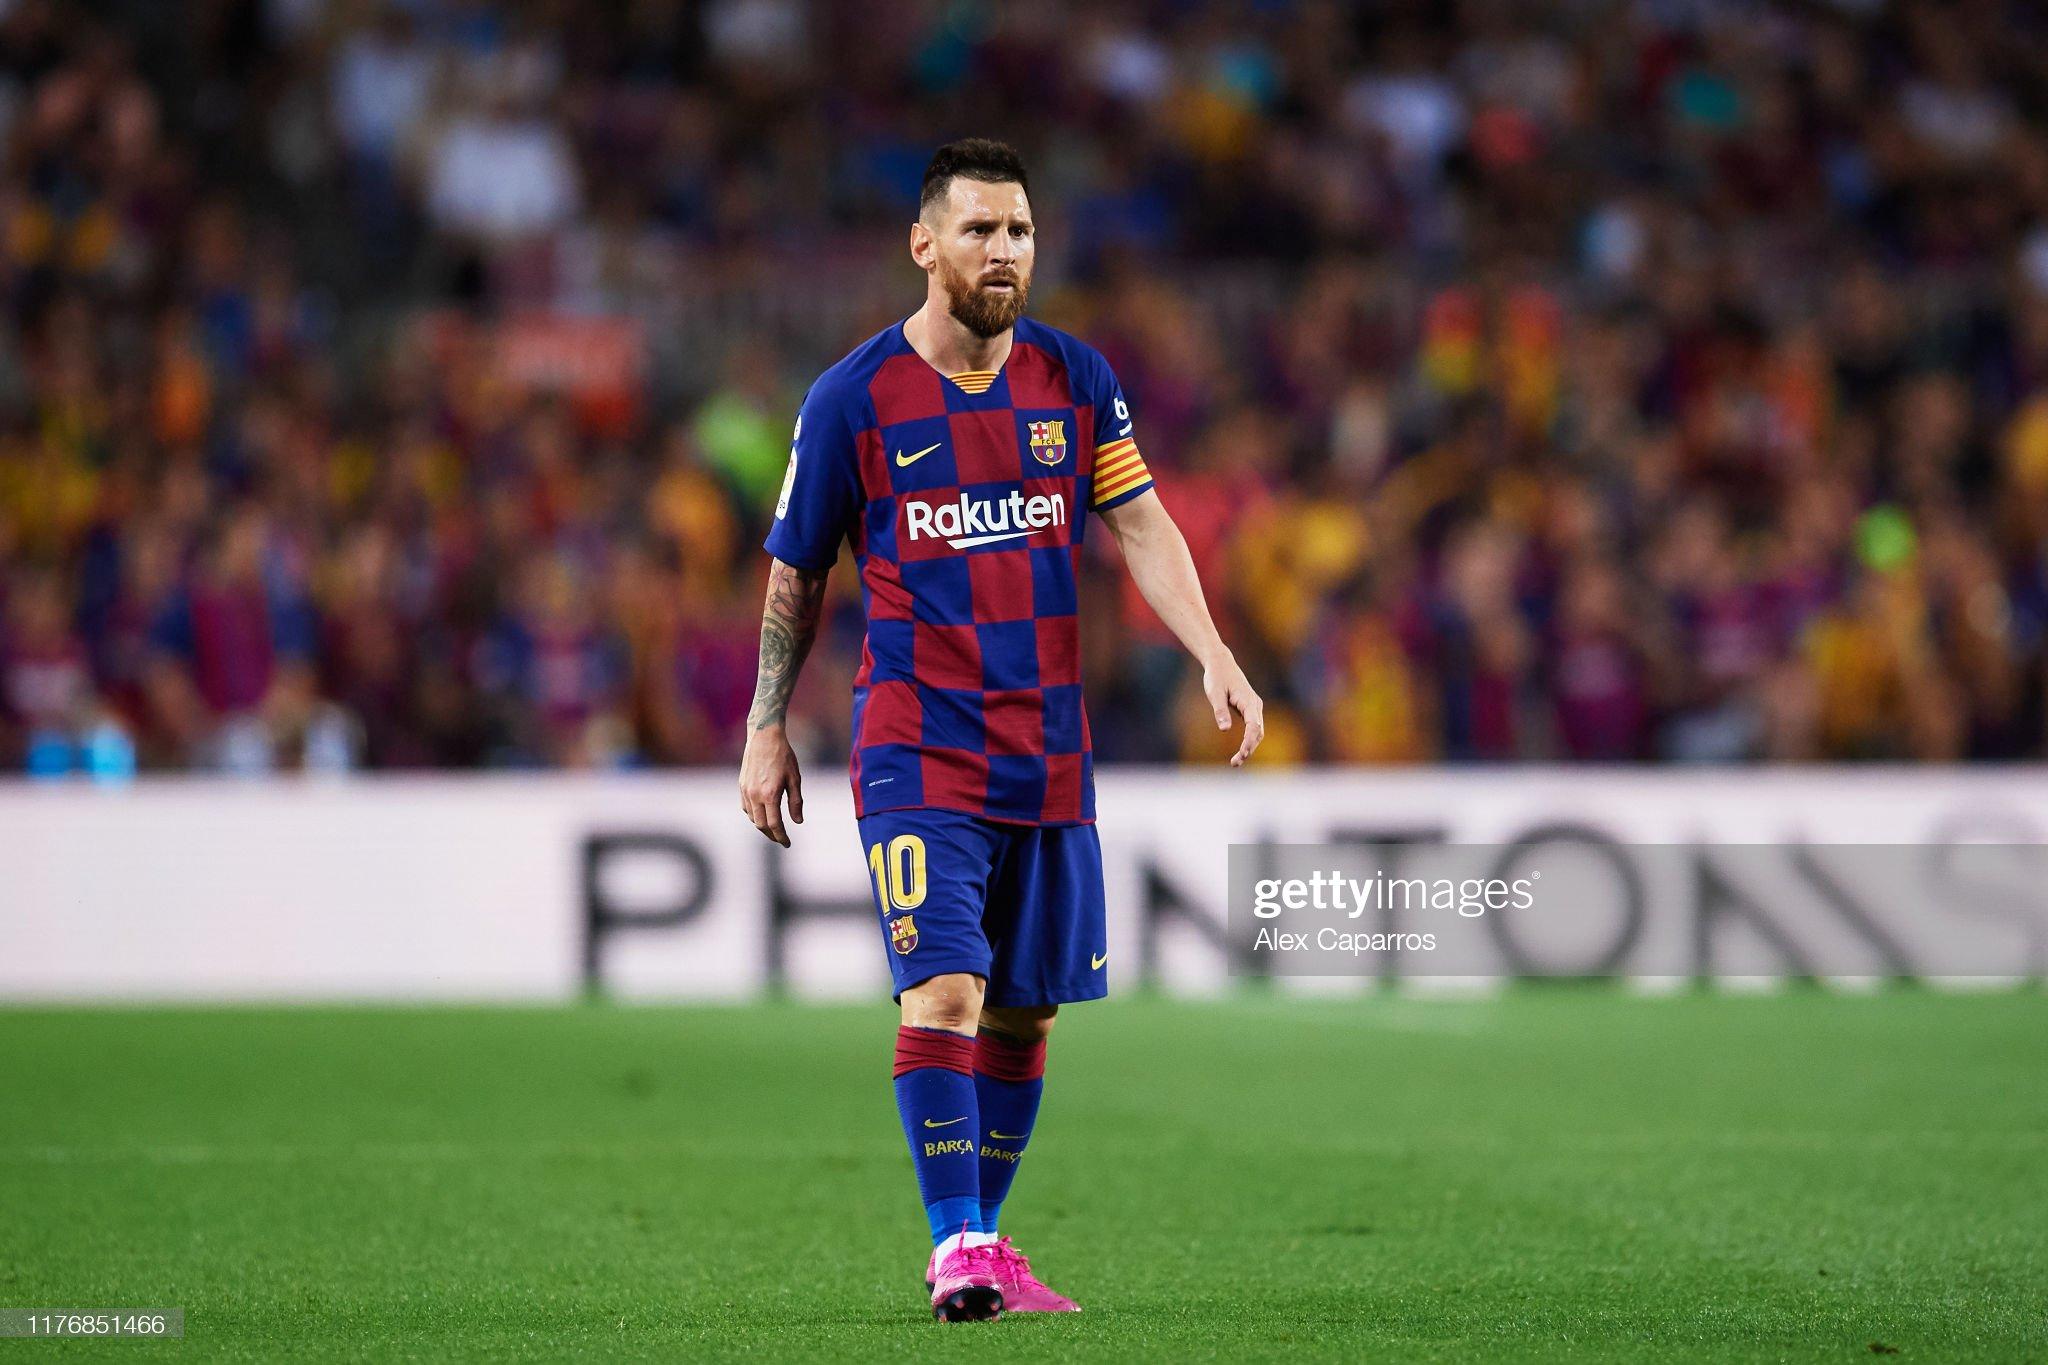 صور مباراة : برشلونة - فياريال 2-1 ( 24-09-2019 )  Lionel-messi-of-fc-barcelona-looks-on-during-the-liga-match-between-picture-id1176851466?s=2048x2048